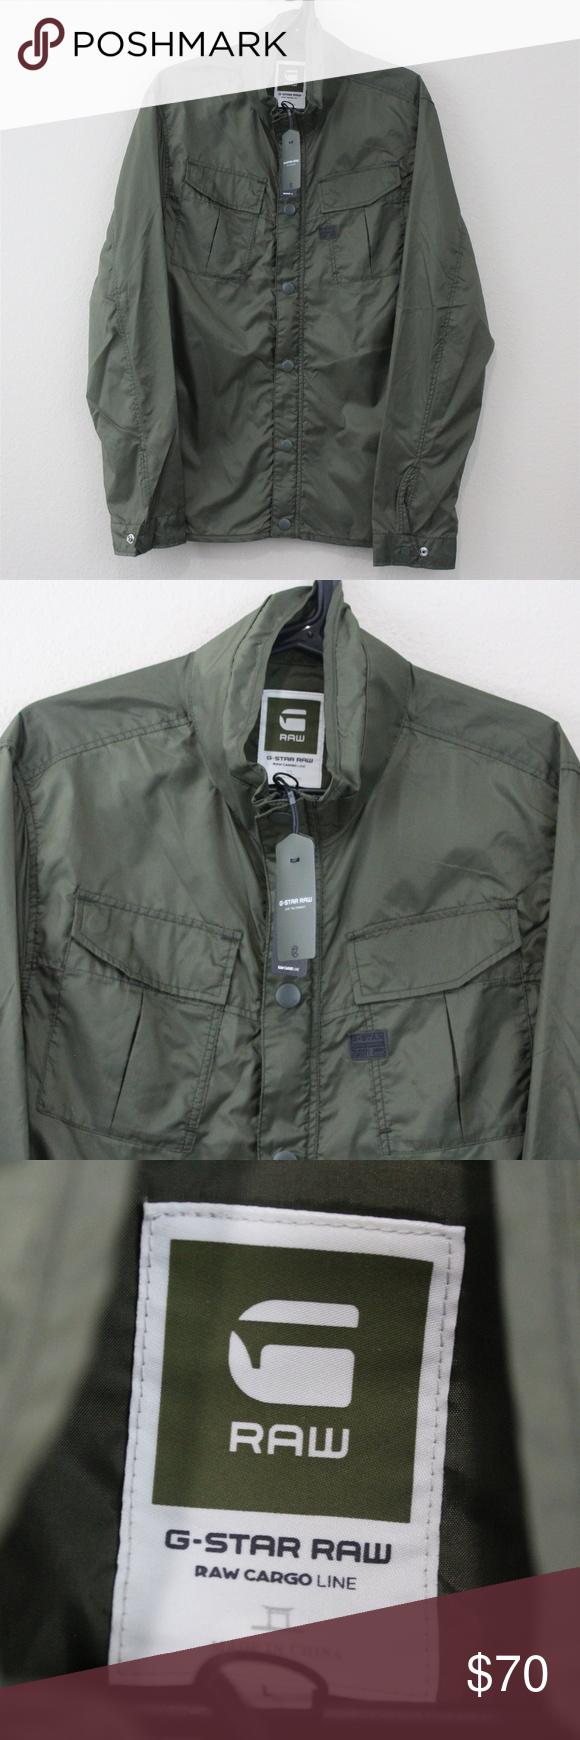 G Star Raw Cargo Line Combat Overshirt Jacket R514 Jackets G Star Jacket G Star